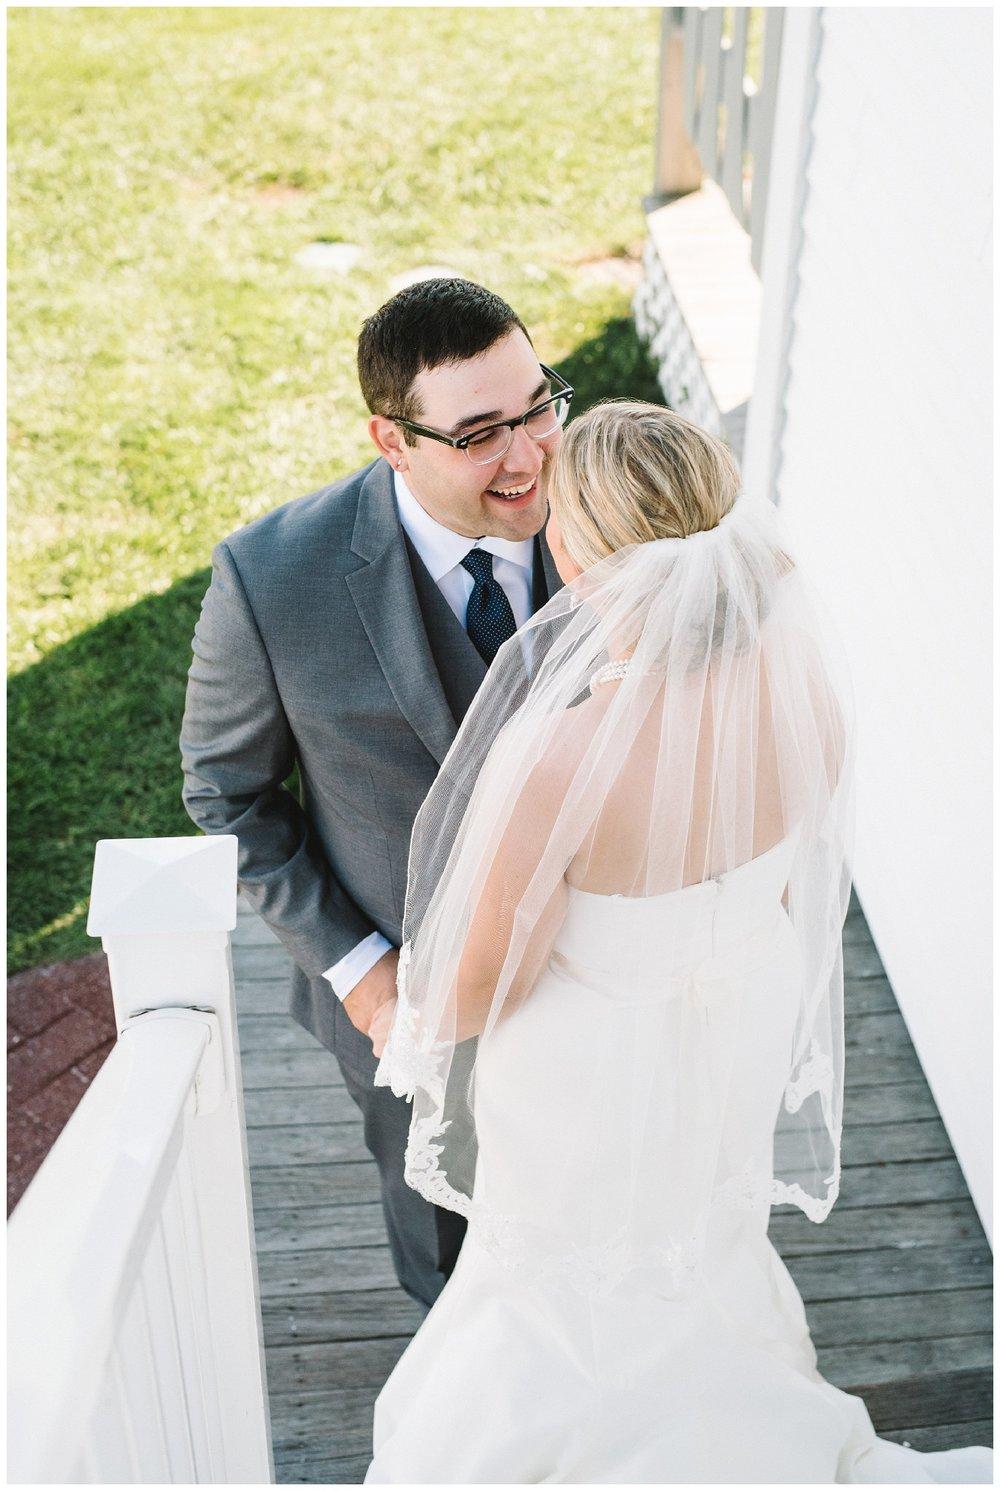 Intimate Cape Cod Beach Wedding Photographer-61.jpg